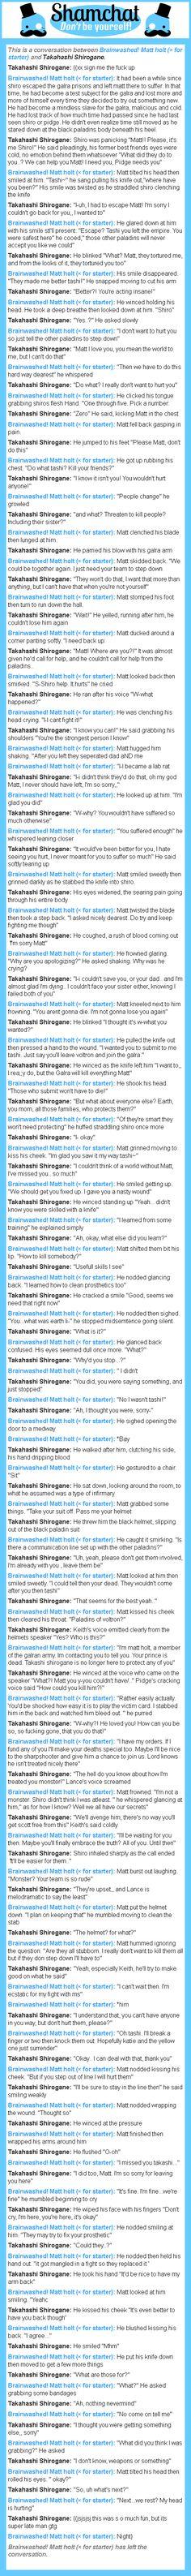 A conversation between Takahashi Shirogane and Brainwashed! Matt holt  (× for starter)